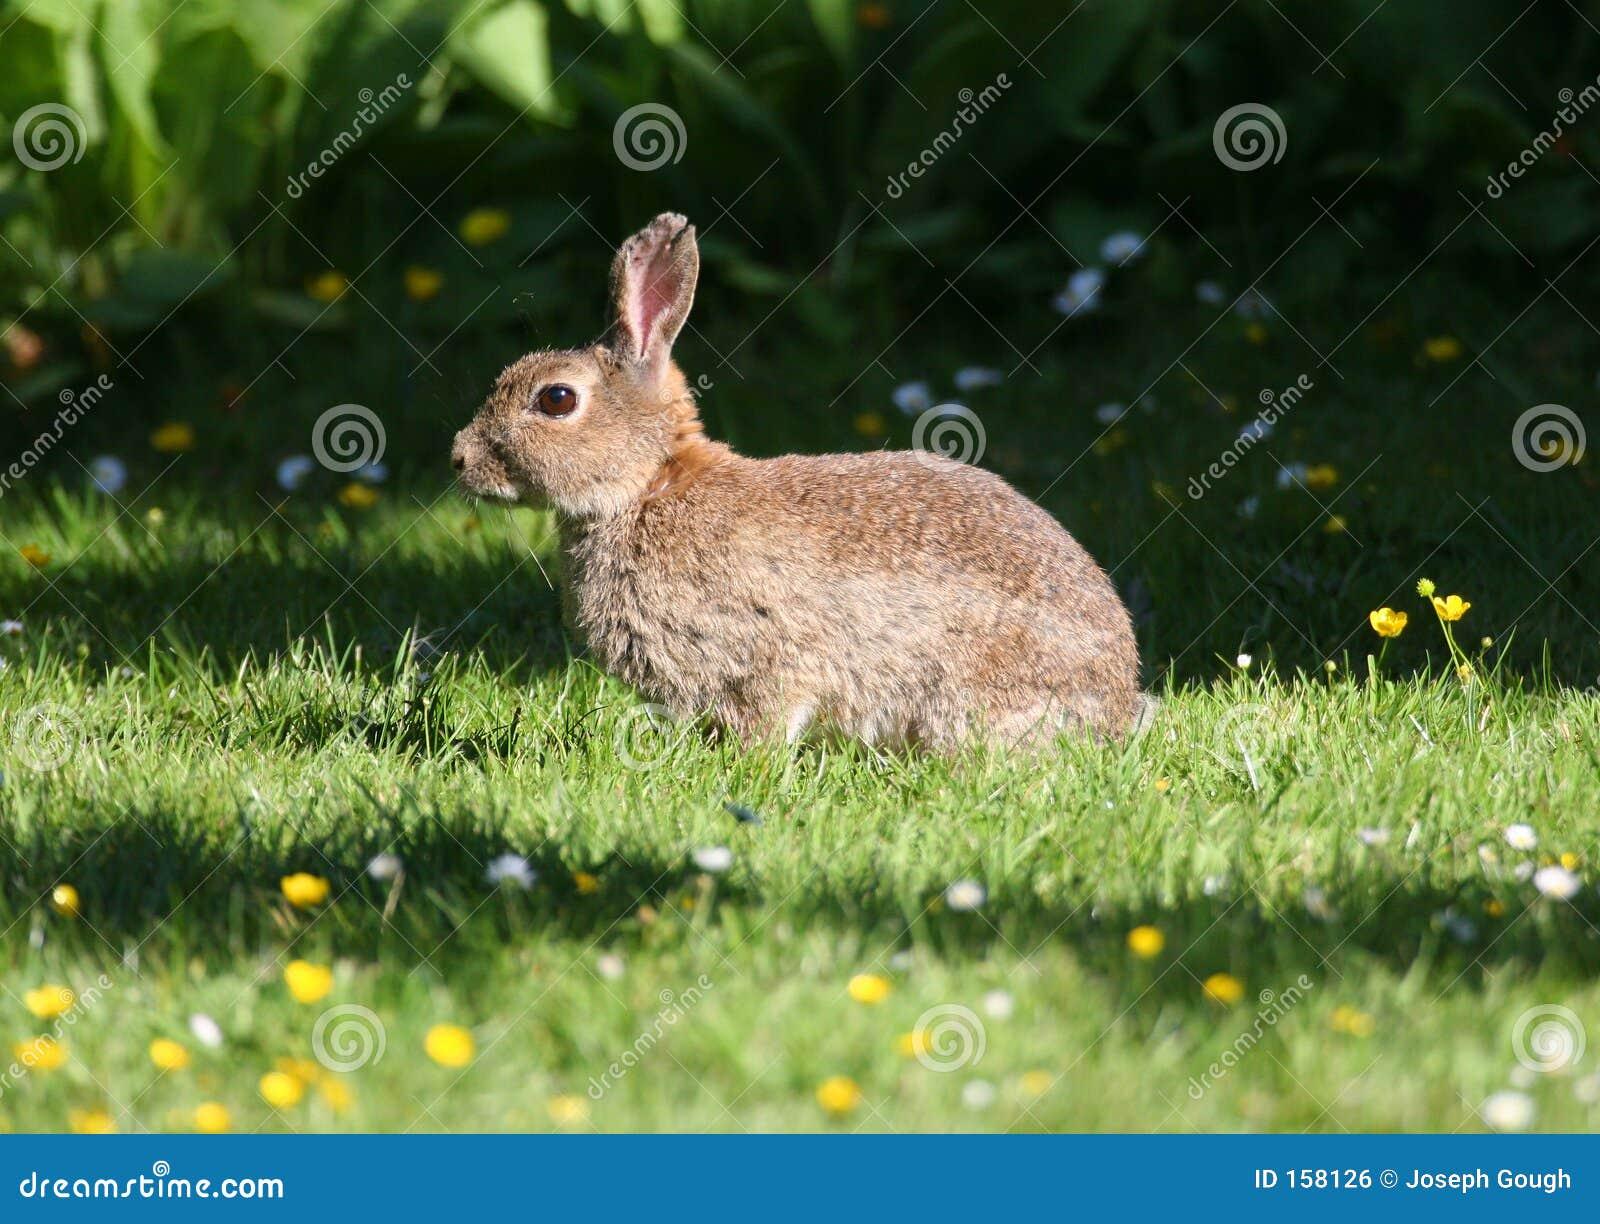 Wild Rabbit in Grass Meadow